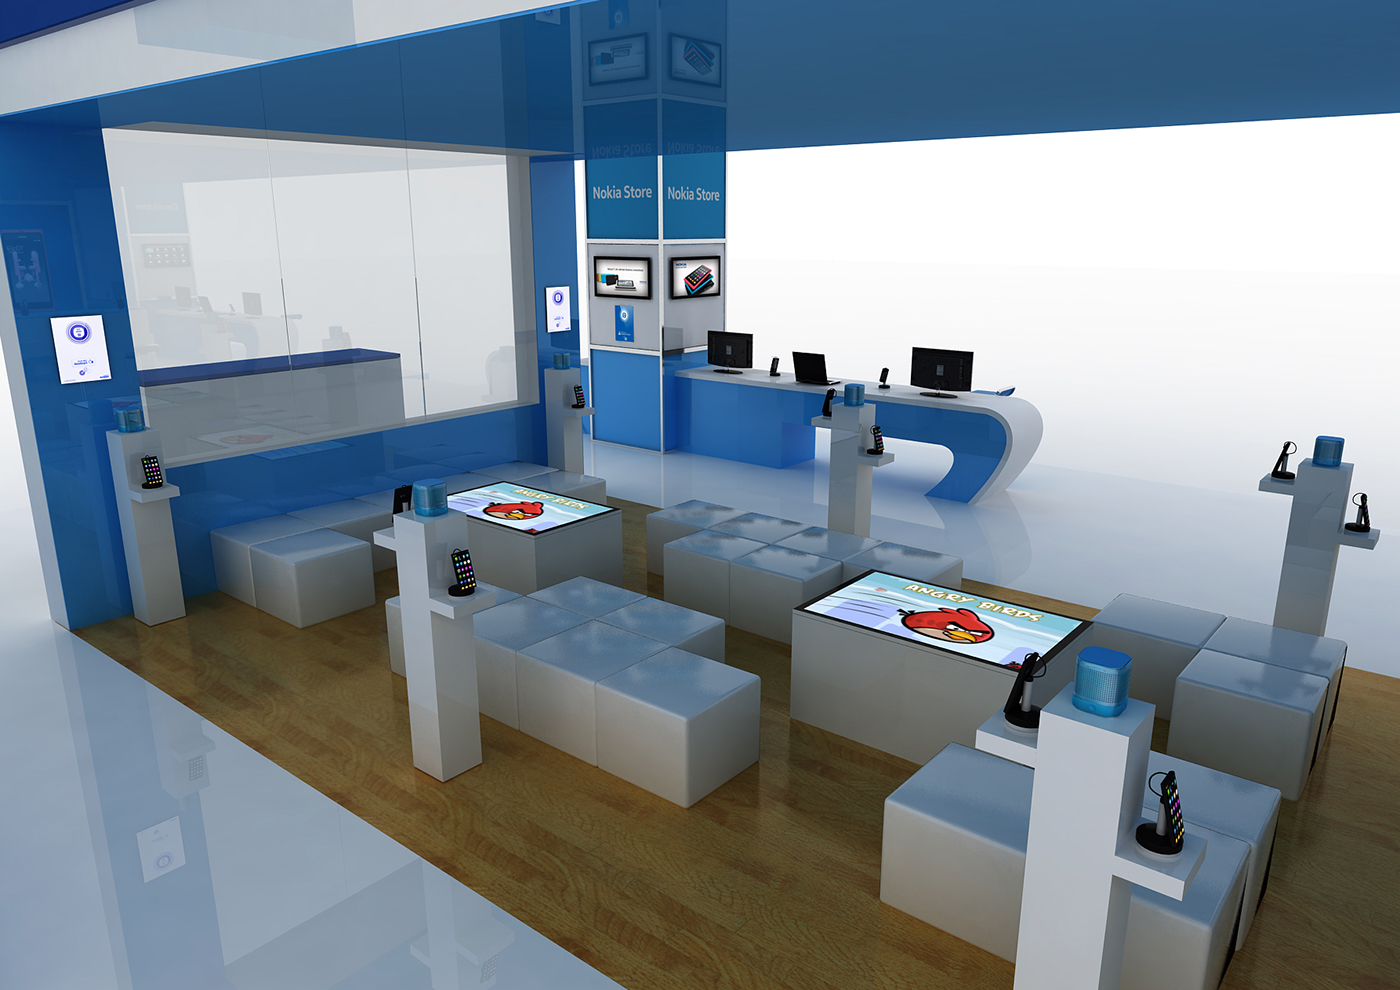 nokia Exhibition  Gitex dubai